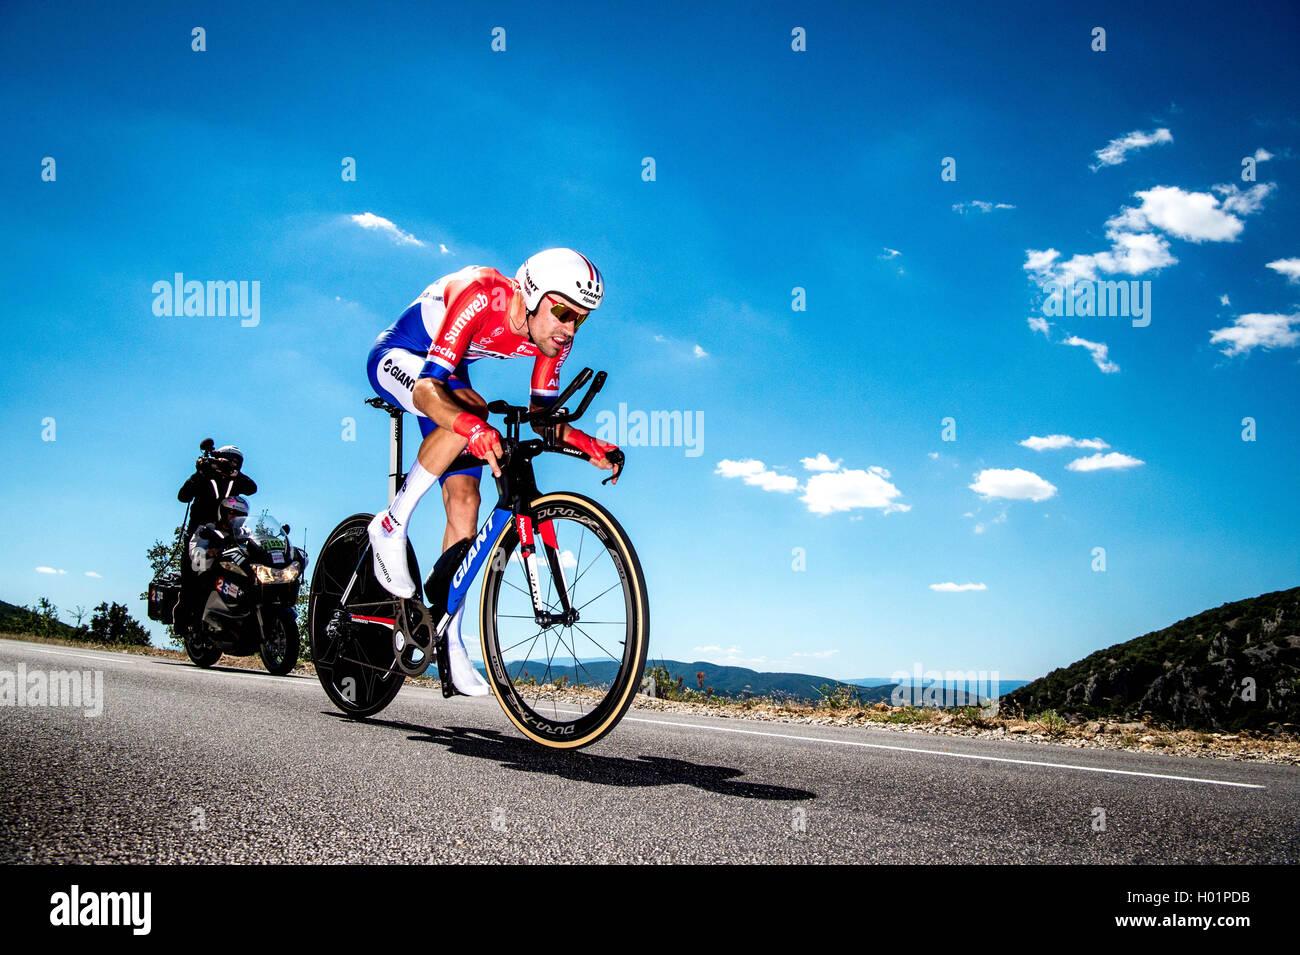 Tour de France 2016 etapa 13 Tom Dumoulin (NED) Bourg-Saint-Andeol a La Carerne du Pont-d'Arc de 37,5km de contrarreloj Imagen De Stock